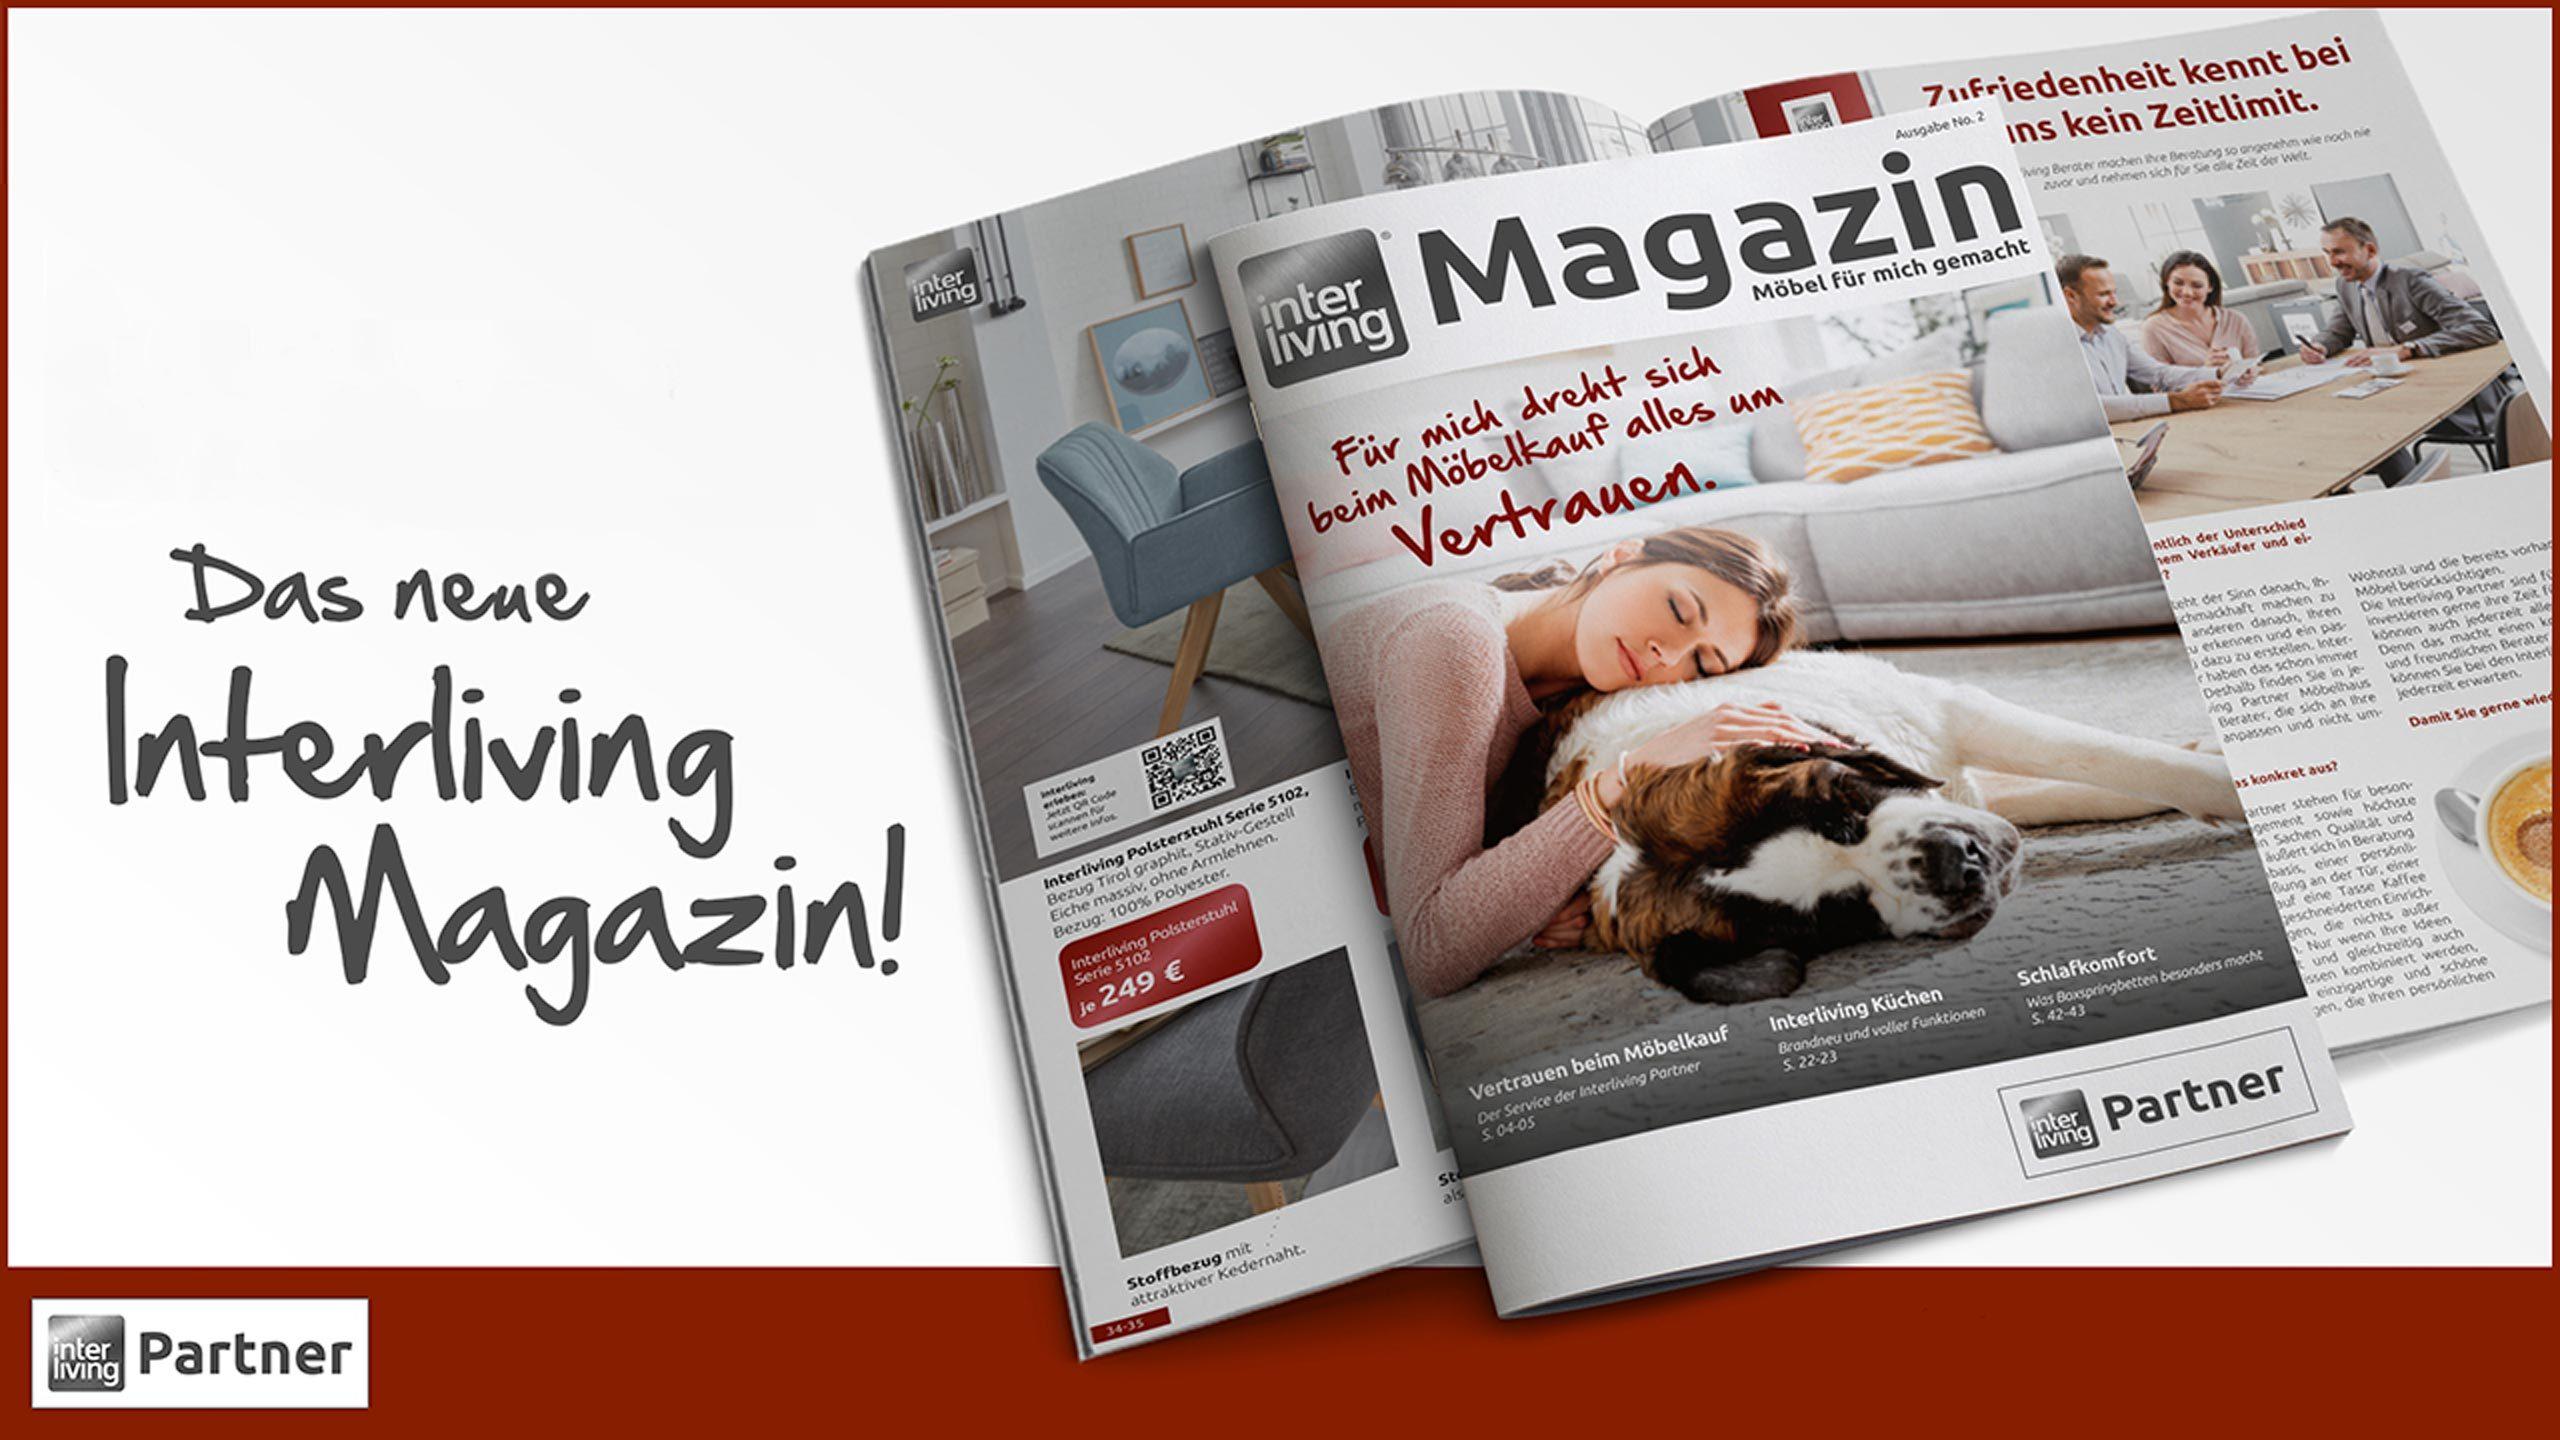 Interliving Partner Magazin Nr. 2 jetzt verfügbar!